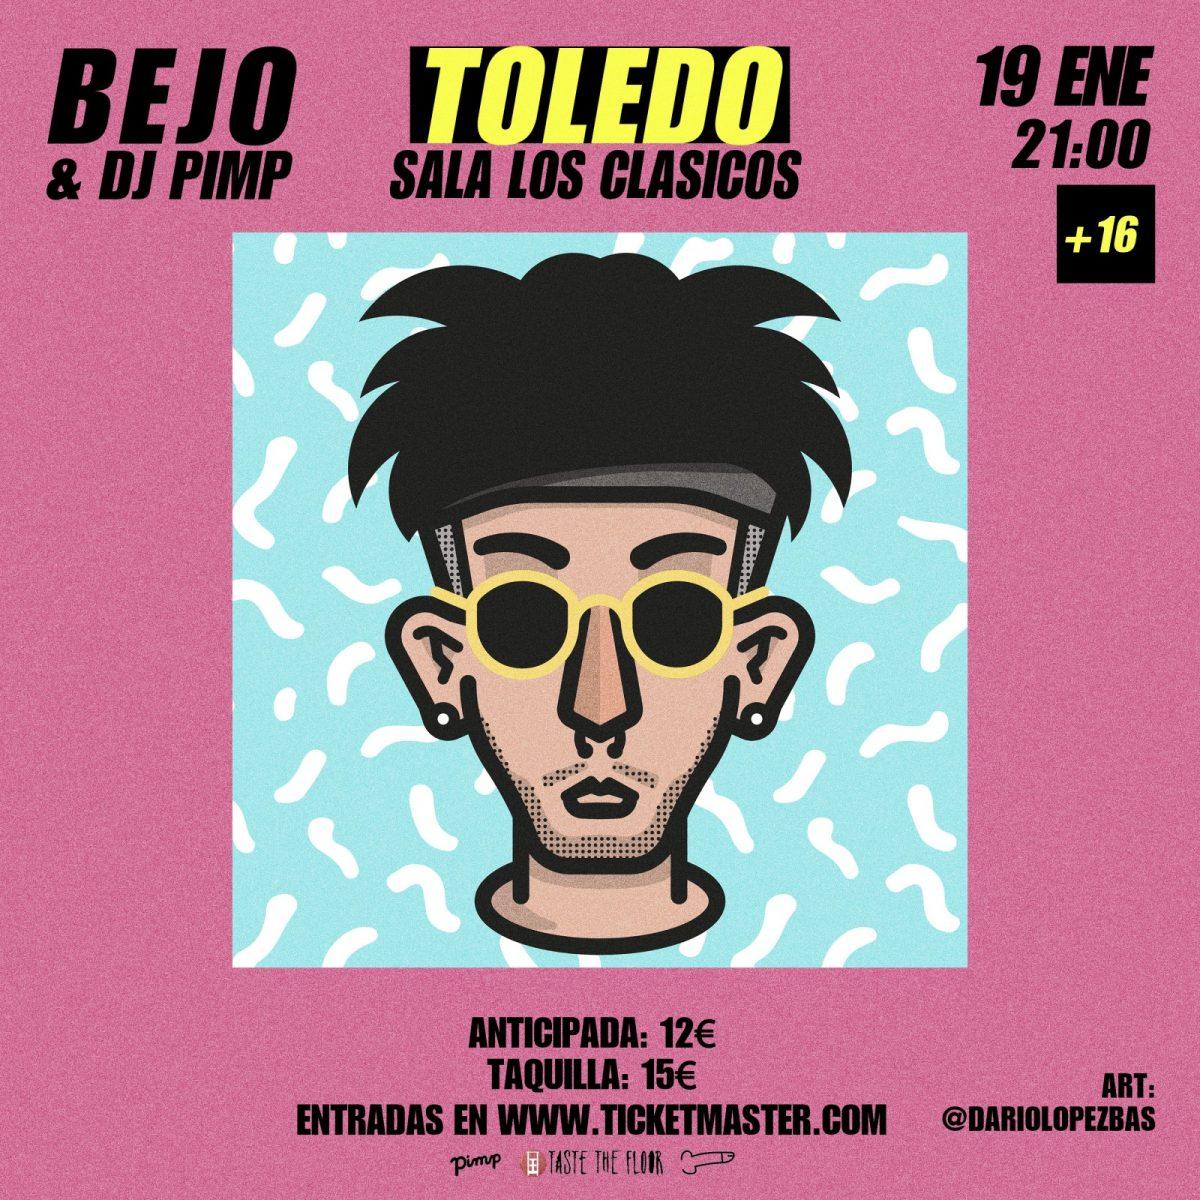 http://www.toledo.es/wp-content/uploads/2018/12/bejo-1200x1200.jpg. Bejo & DJ PIMP